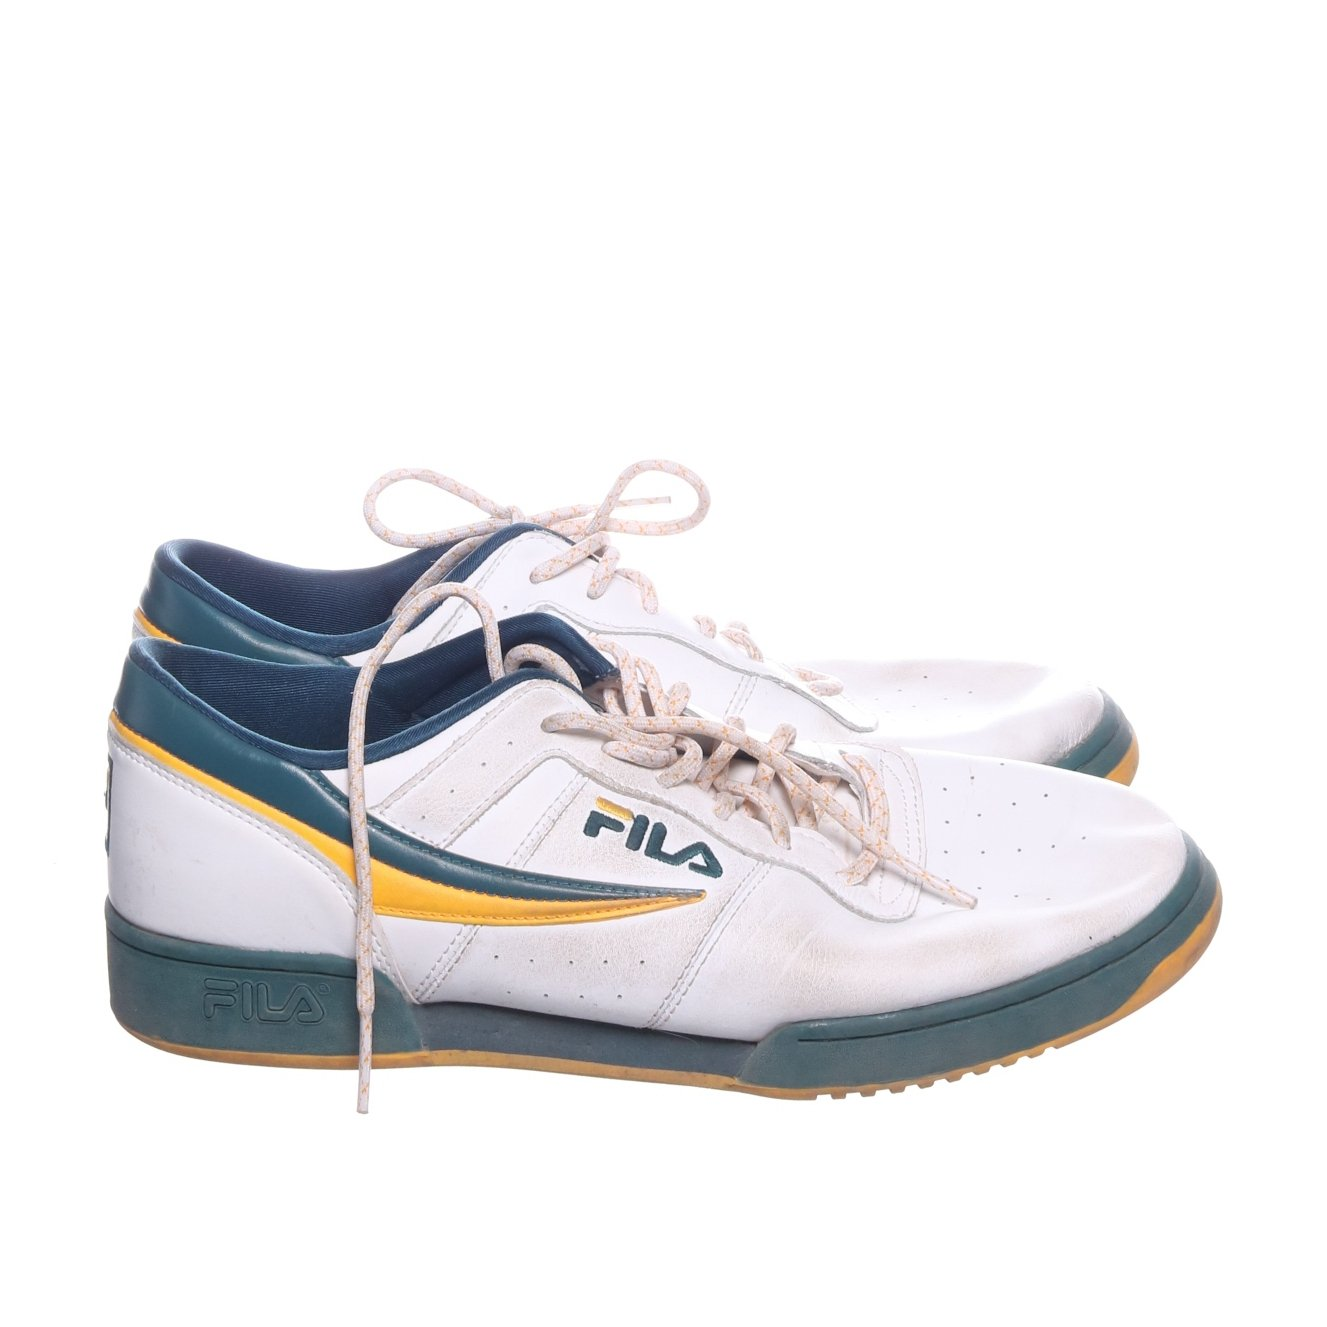 Fila, Sneakers, Strl: 44 12, VitBl?Gul (350304029) ?